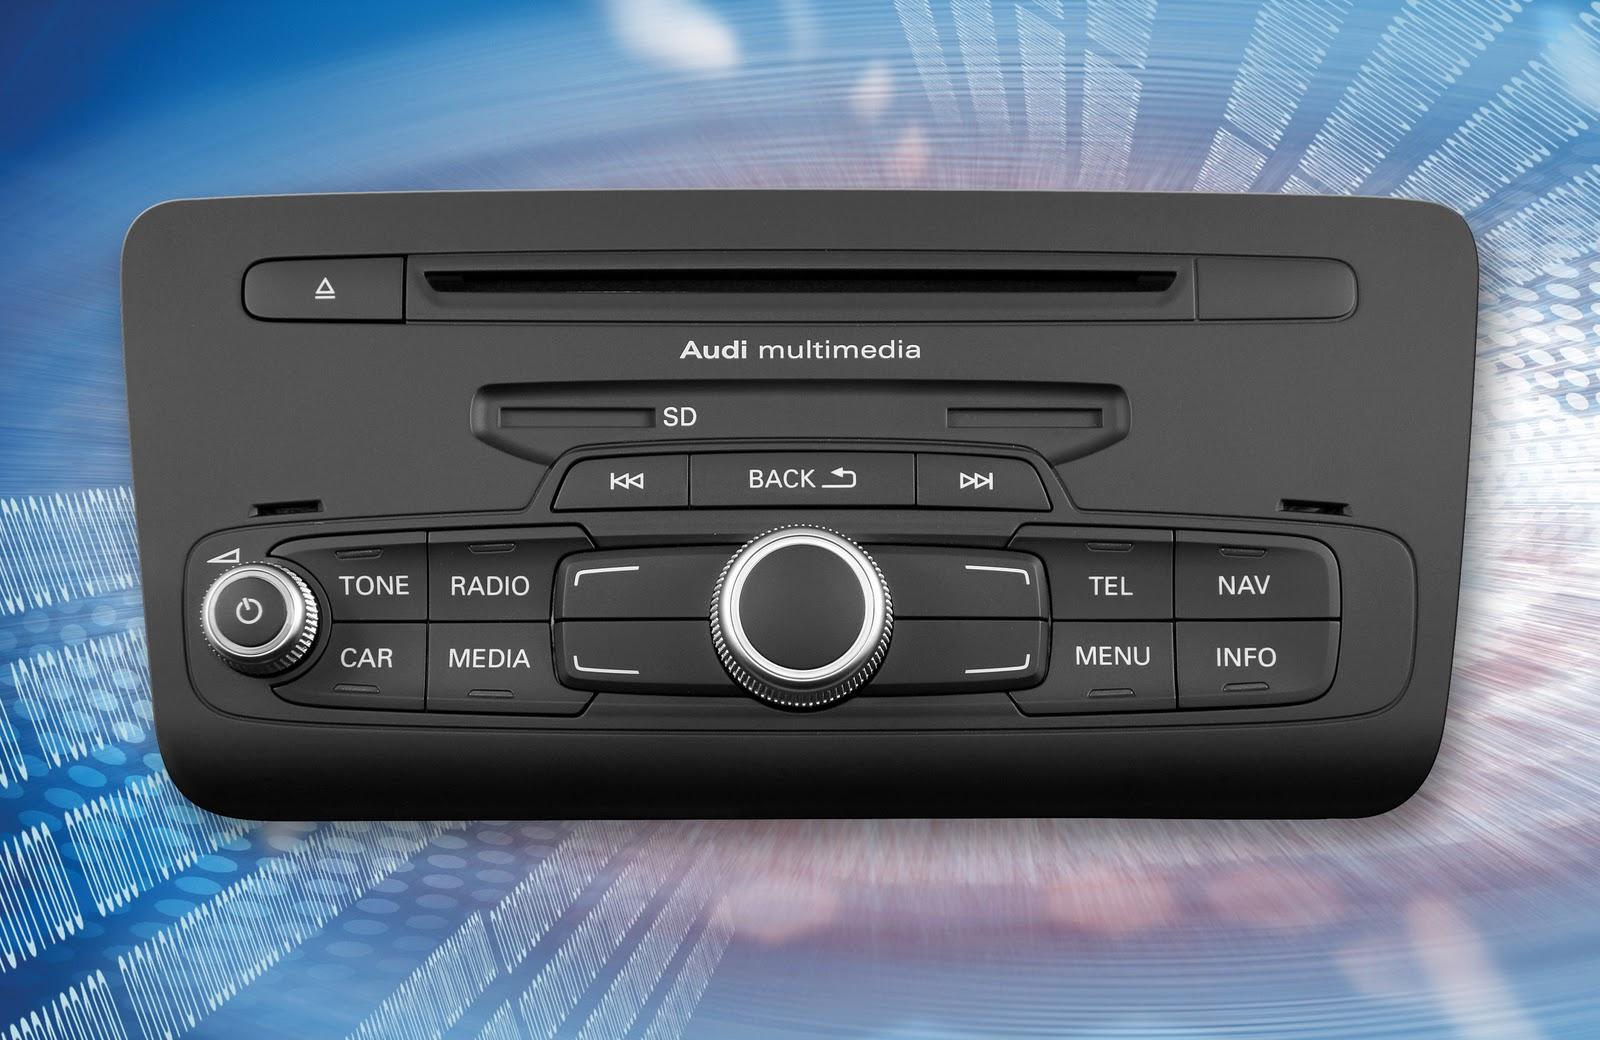 voiture communicante delphi fournit audi une plateforme innovante de radio navigation. Black Bedroom Furniture Sets. Home Design Ideas